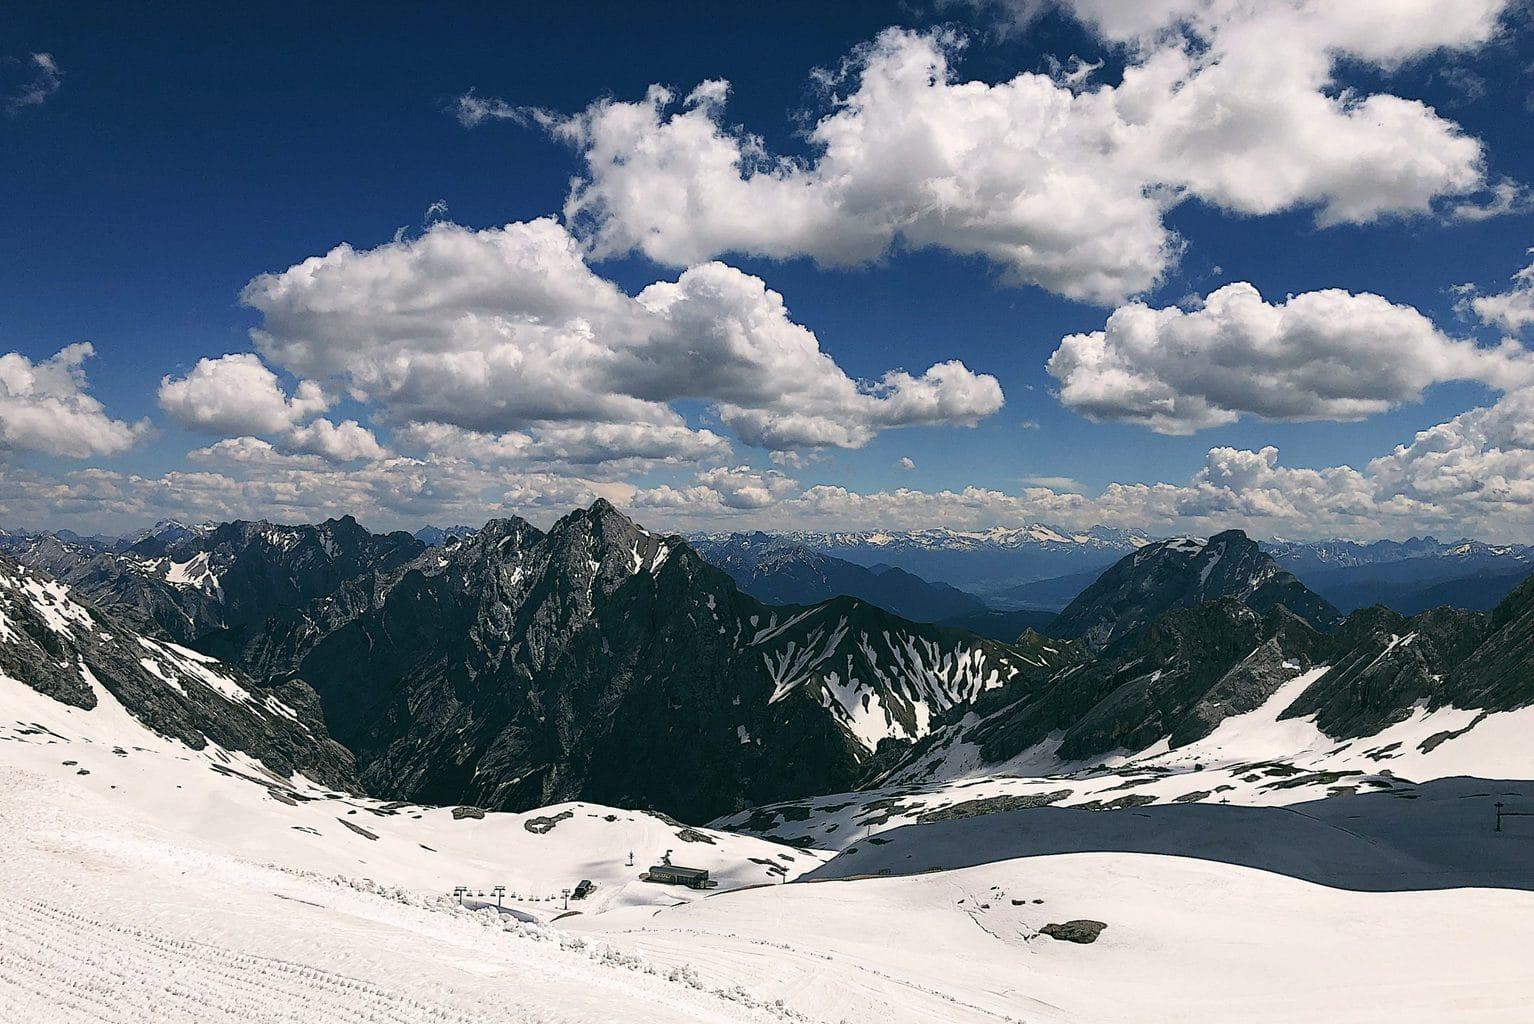 In de Alpen bij Garmisch Partenkirchen kun je skieën ondanks corona